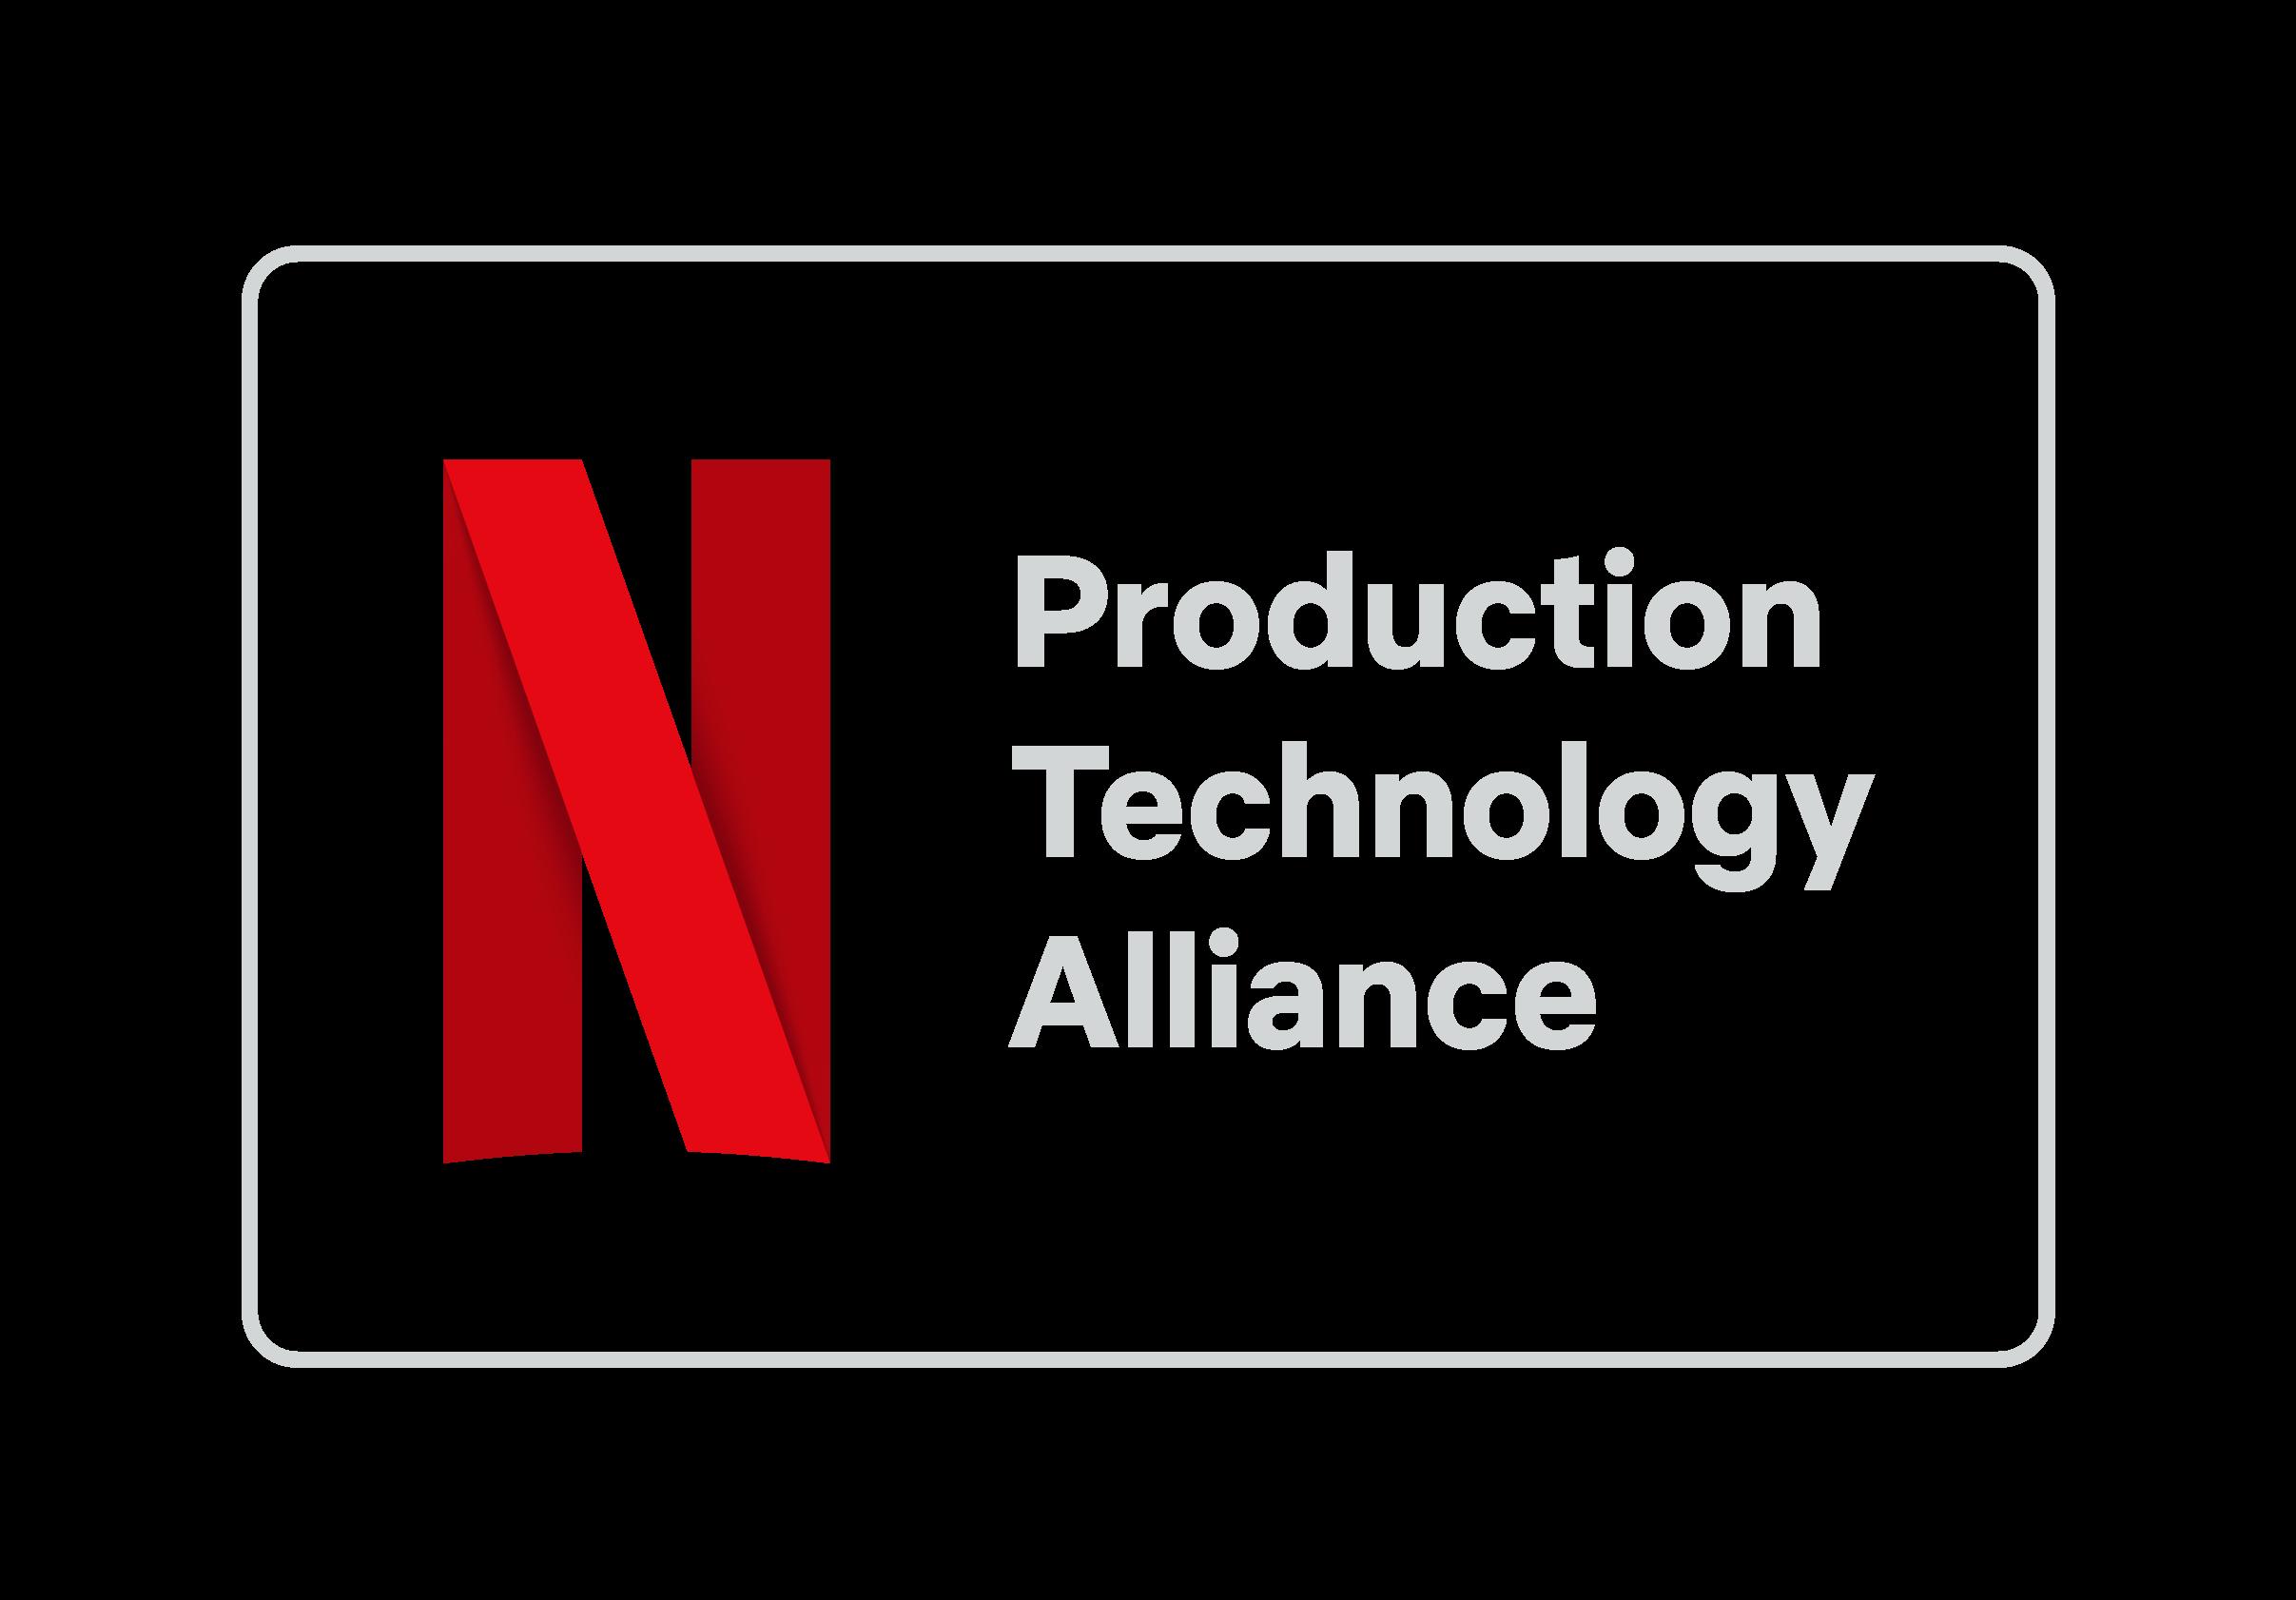 Netflix_Production_Technology_Alliance